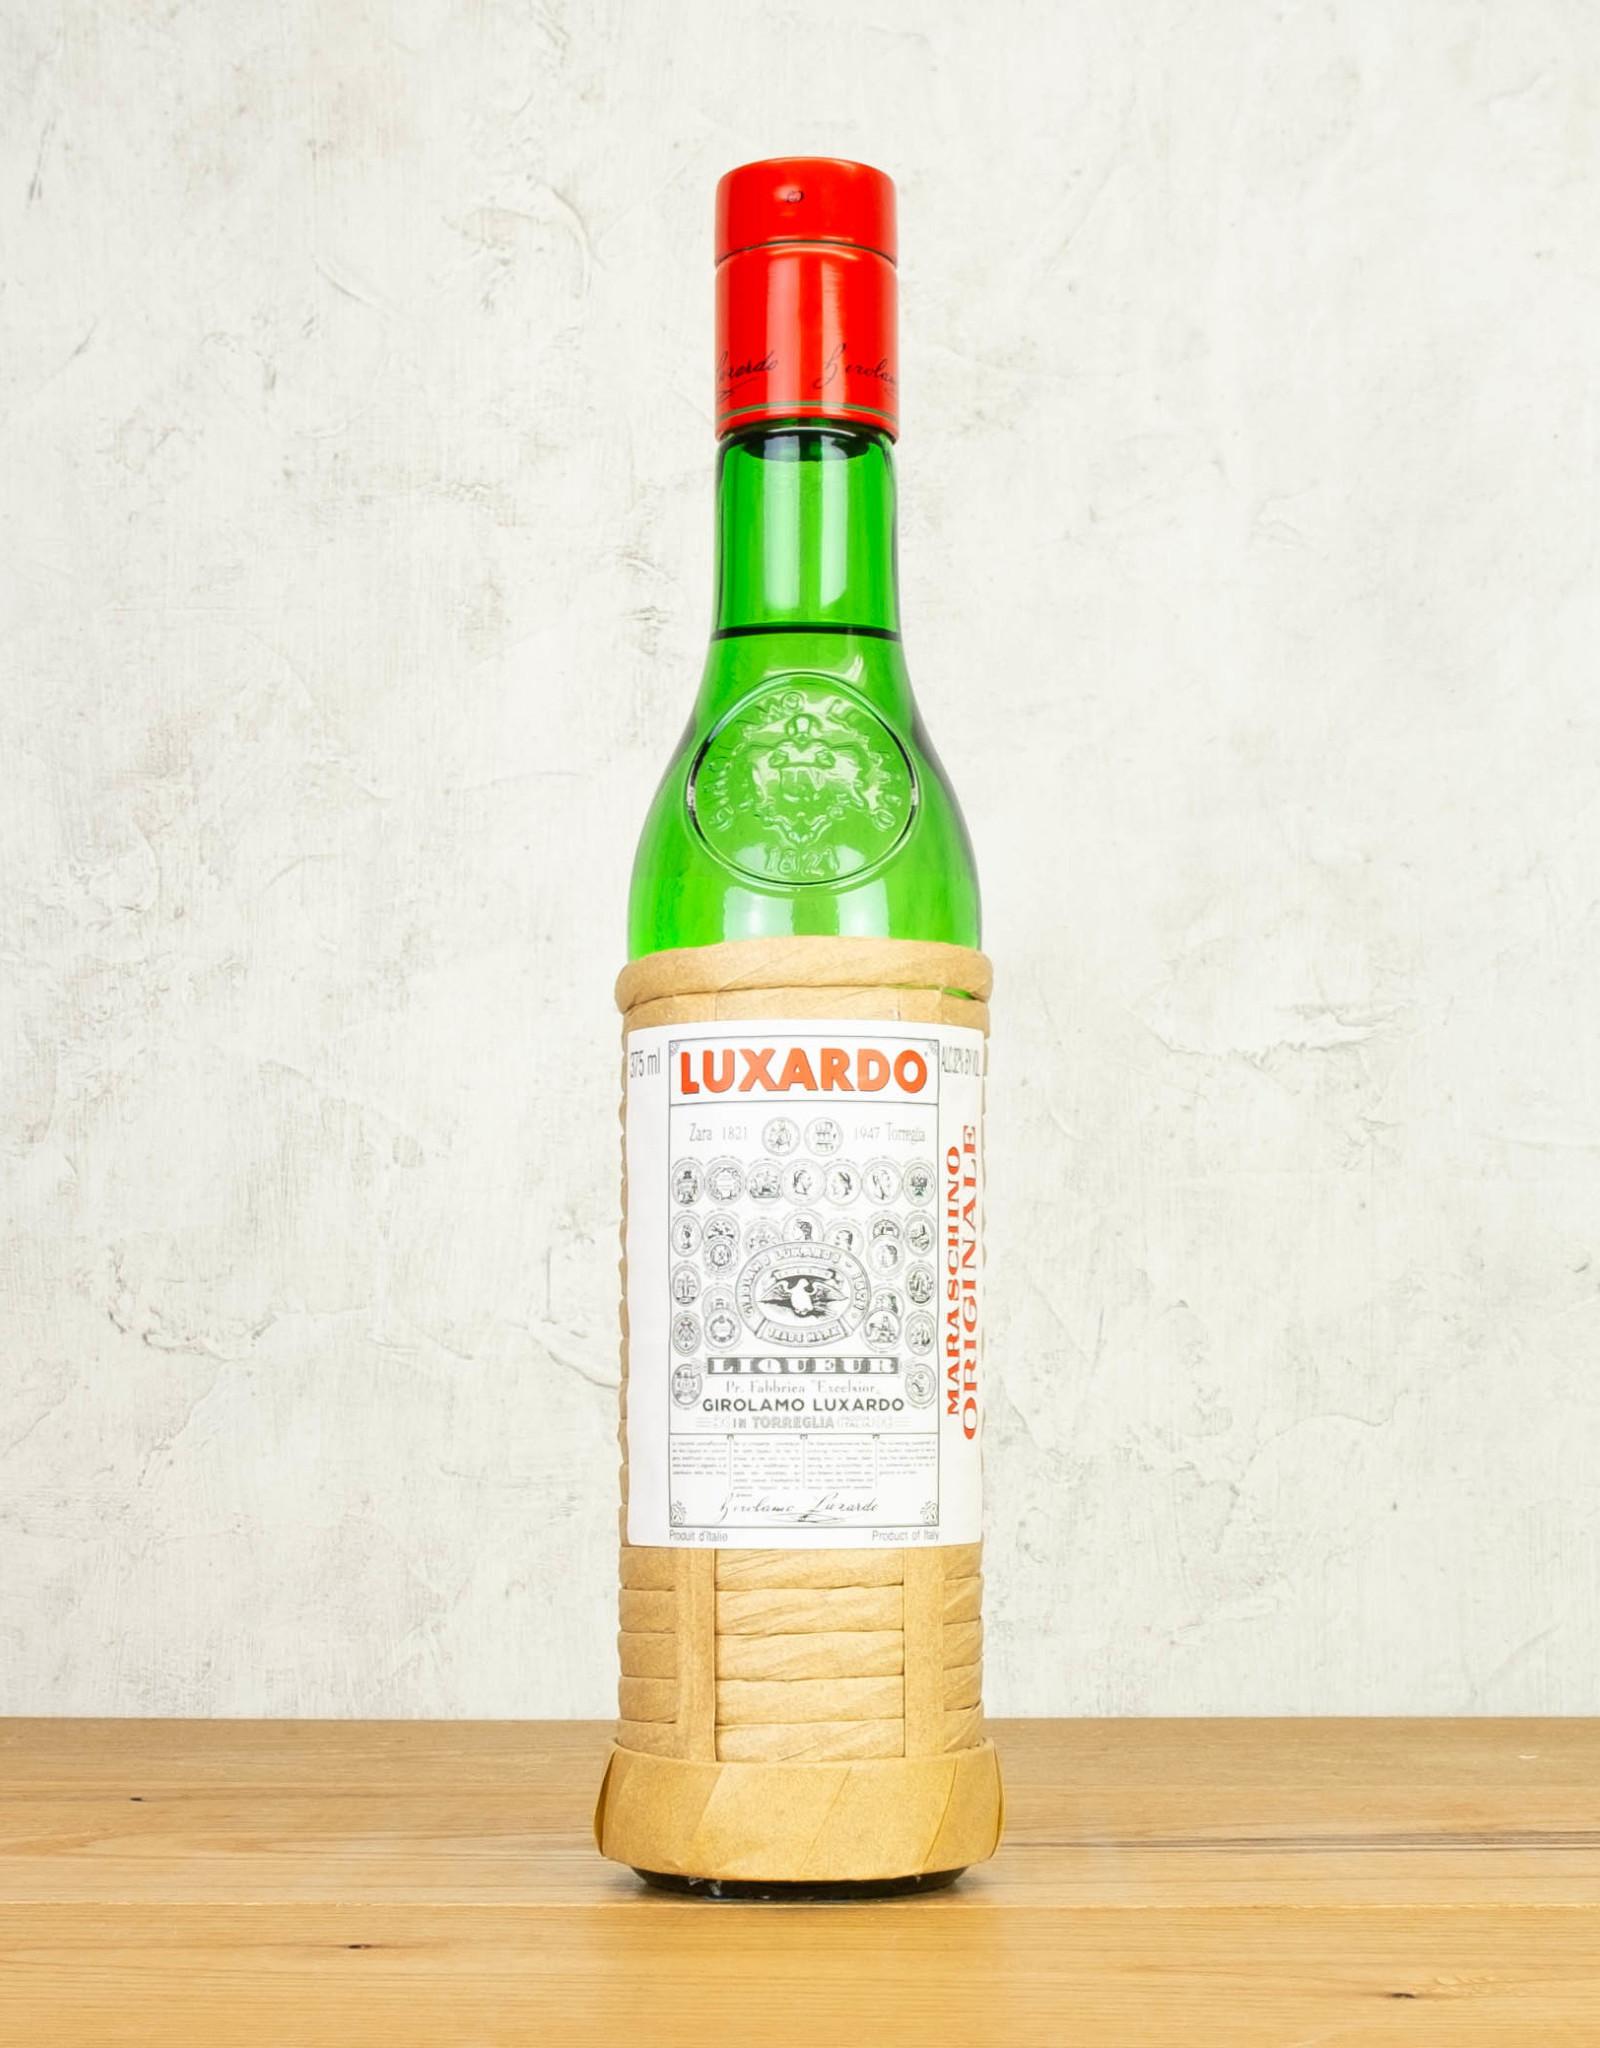 Luxardo Maraschino Liqueur 375ml